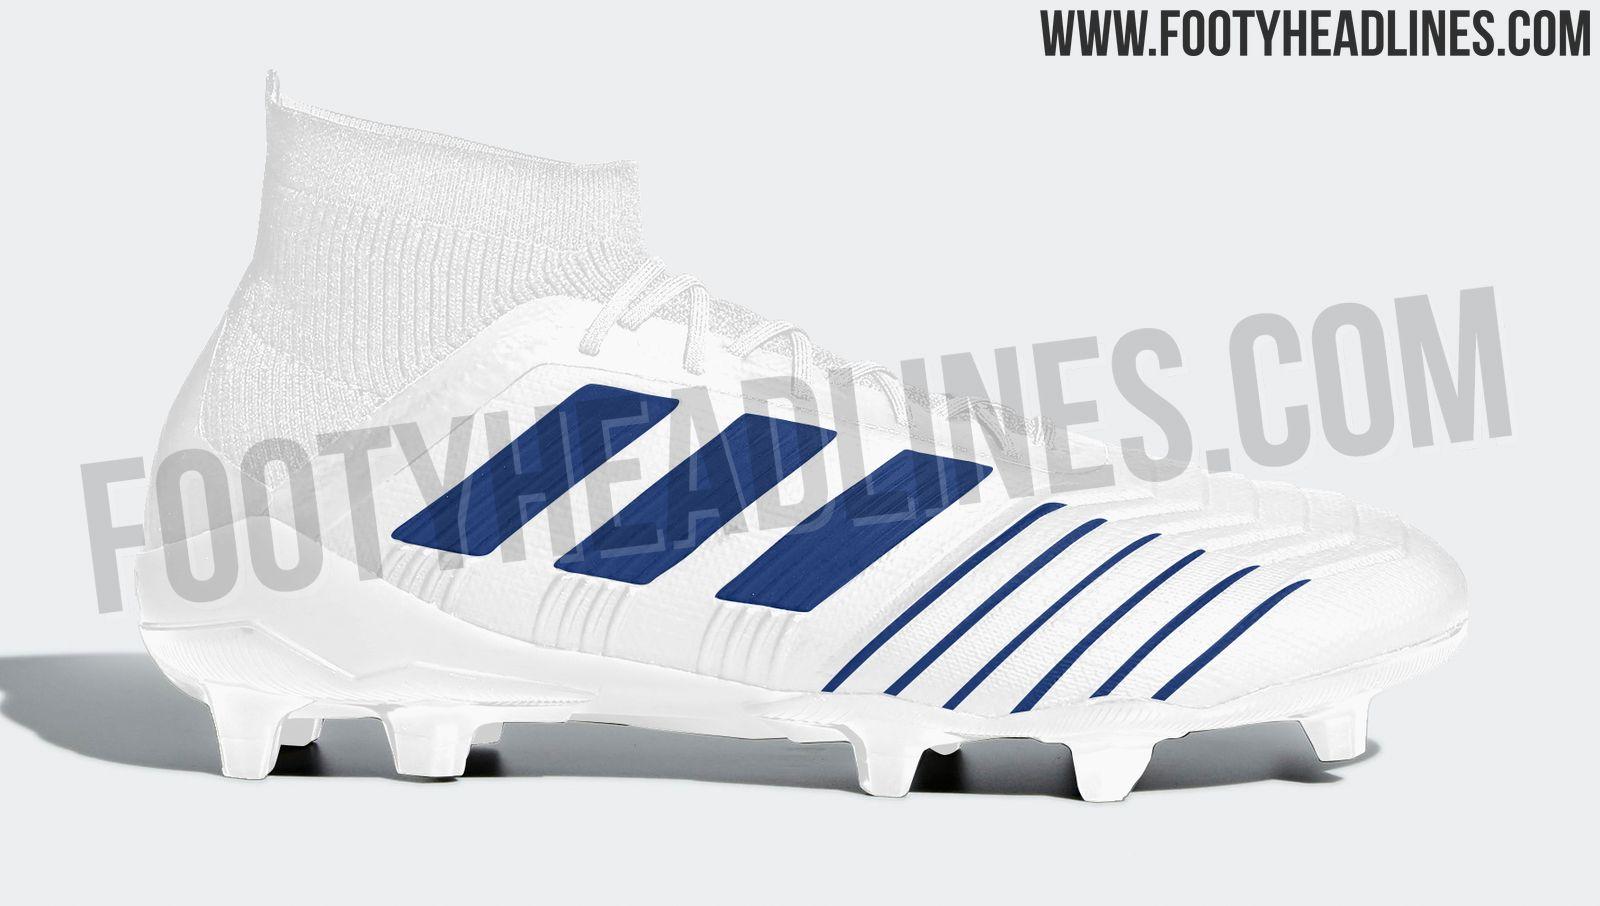 c18a0693b Incl. Next-Gen Copa   Predator - White Adidas 2019 Virtuso Pack ...